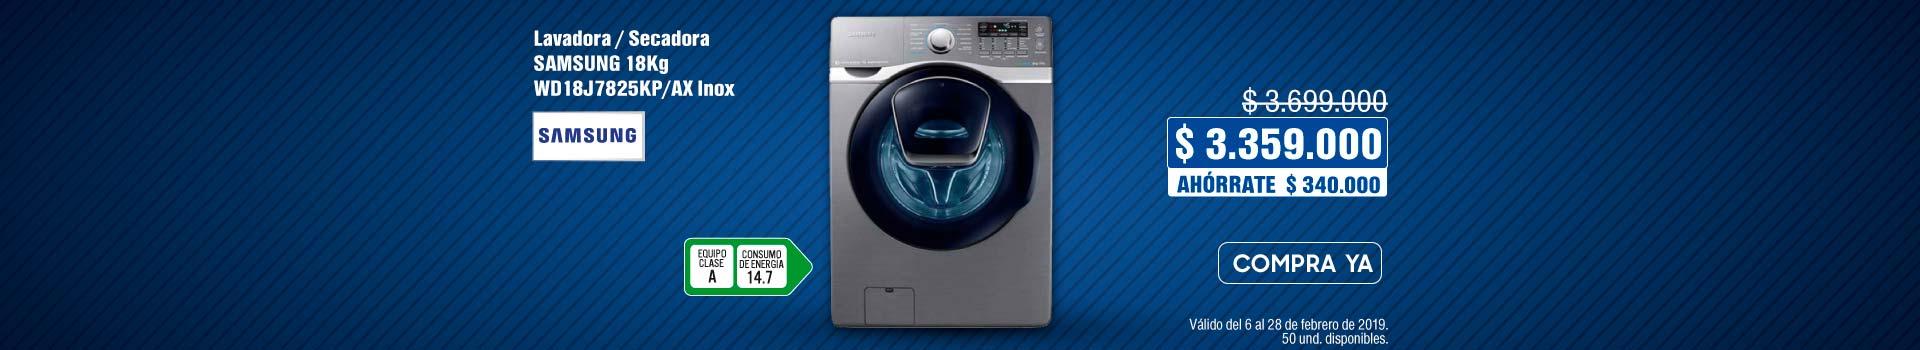 AK-KT-mayores-3-ELECT-BCAT-lavadoras-050219